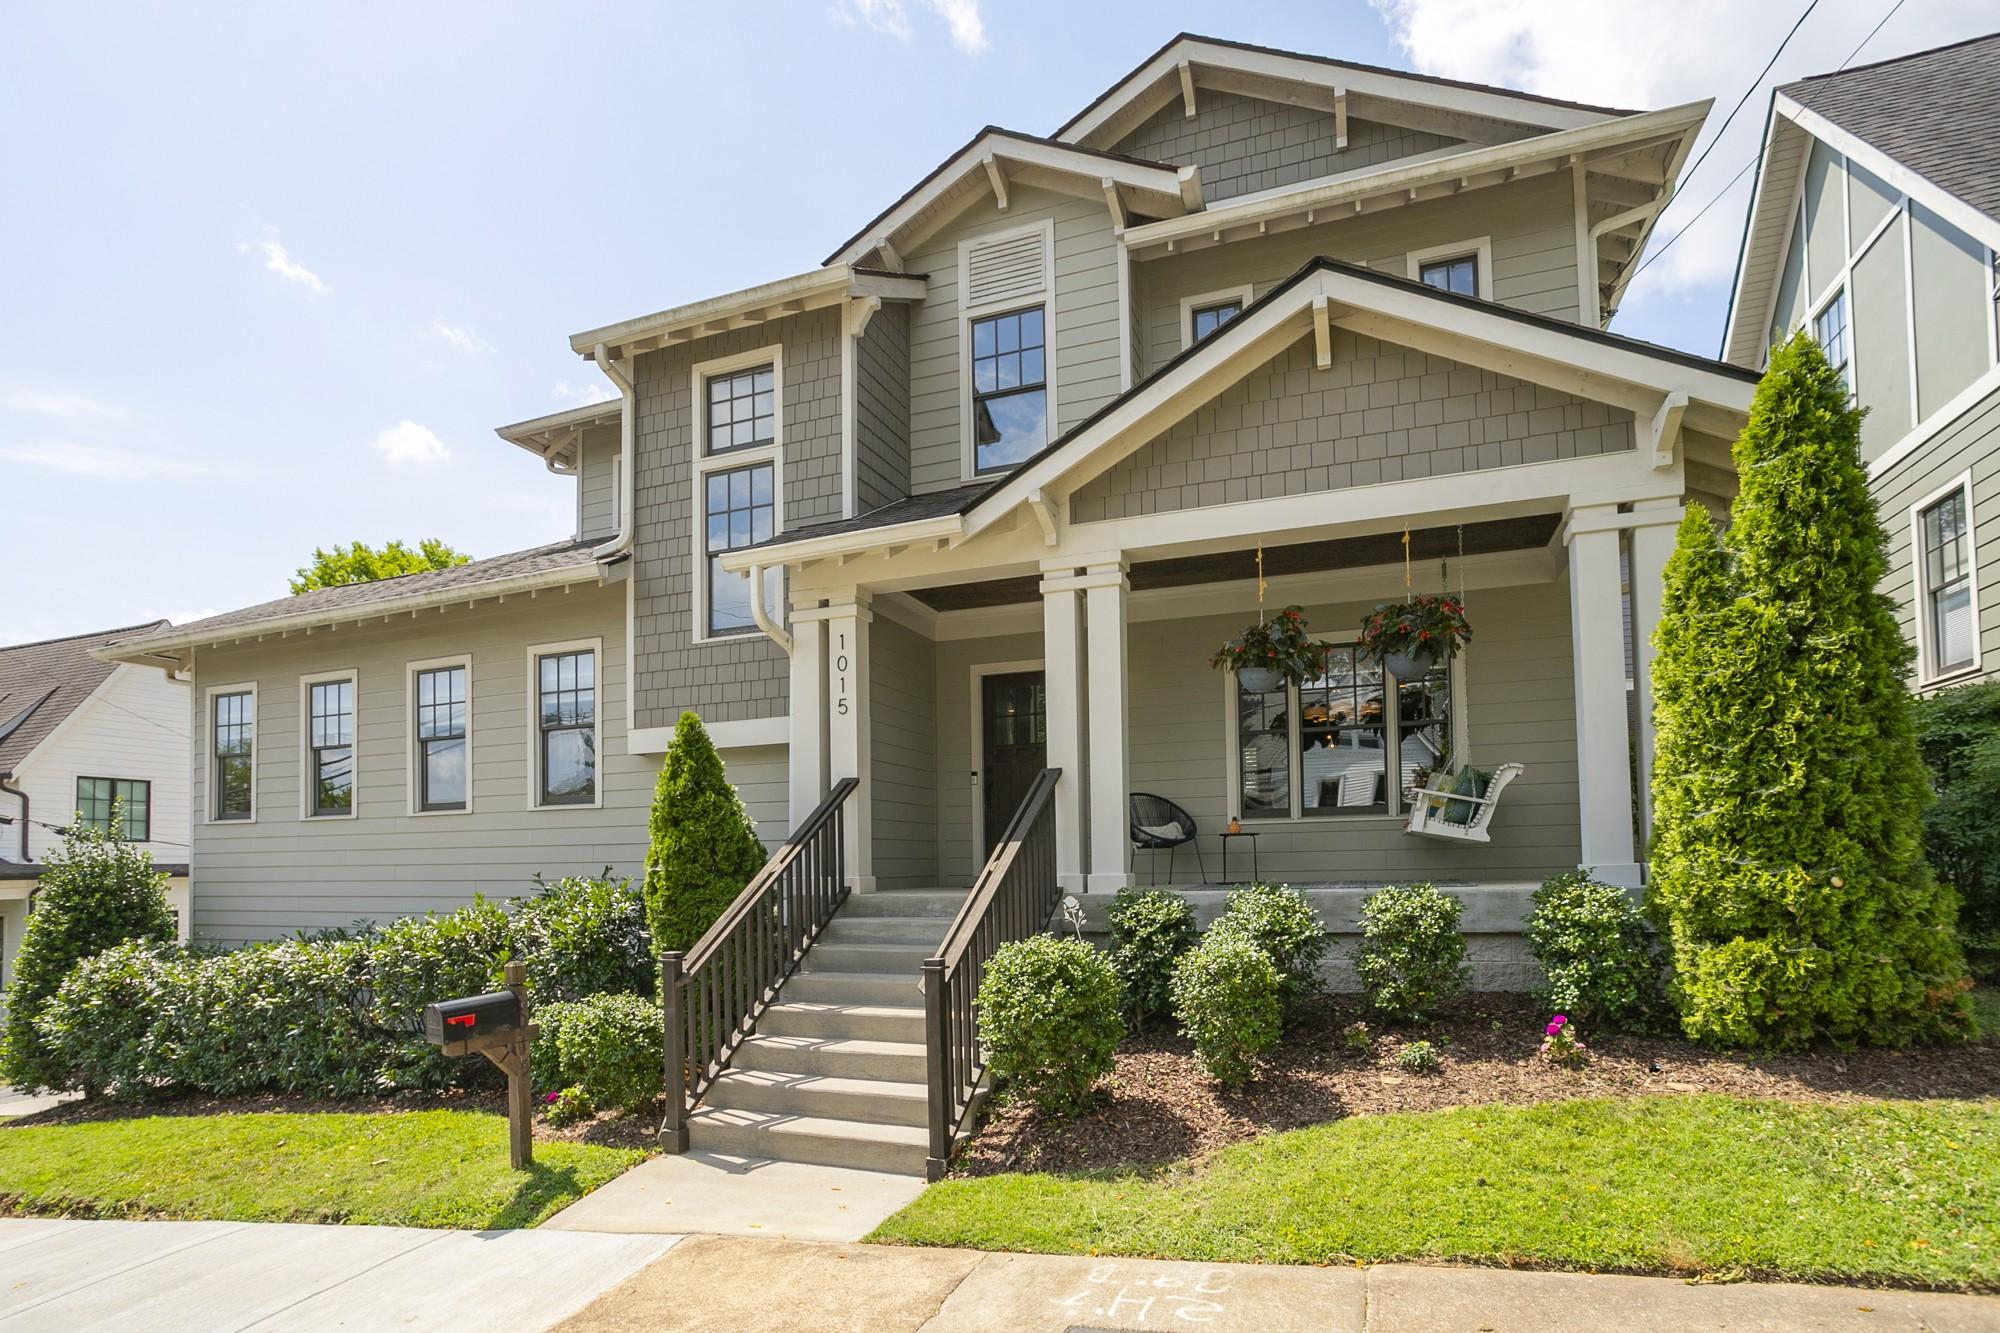 1015 Lawrence Ave Property Photo - Nashville, TN real estate listing